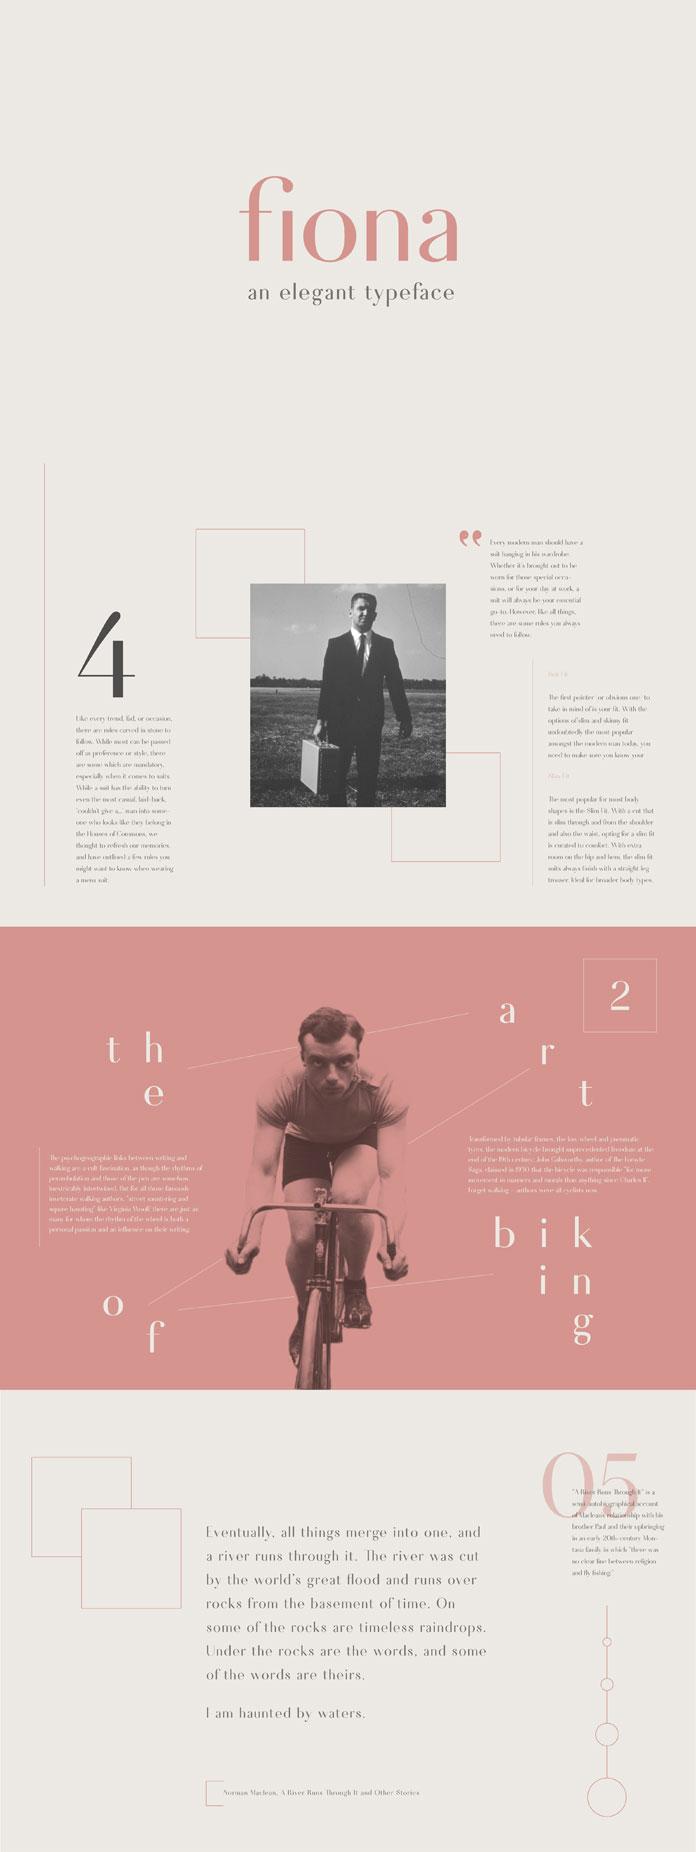 Fiona, an elegant typeface.